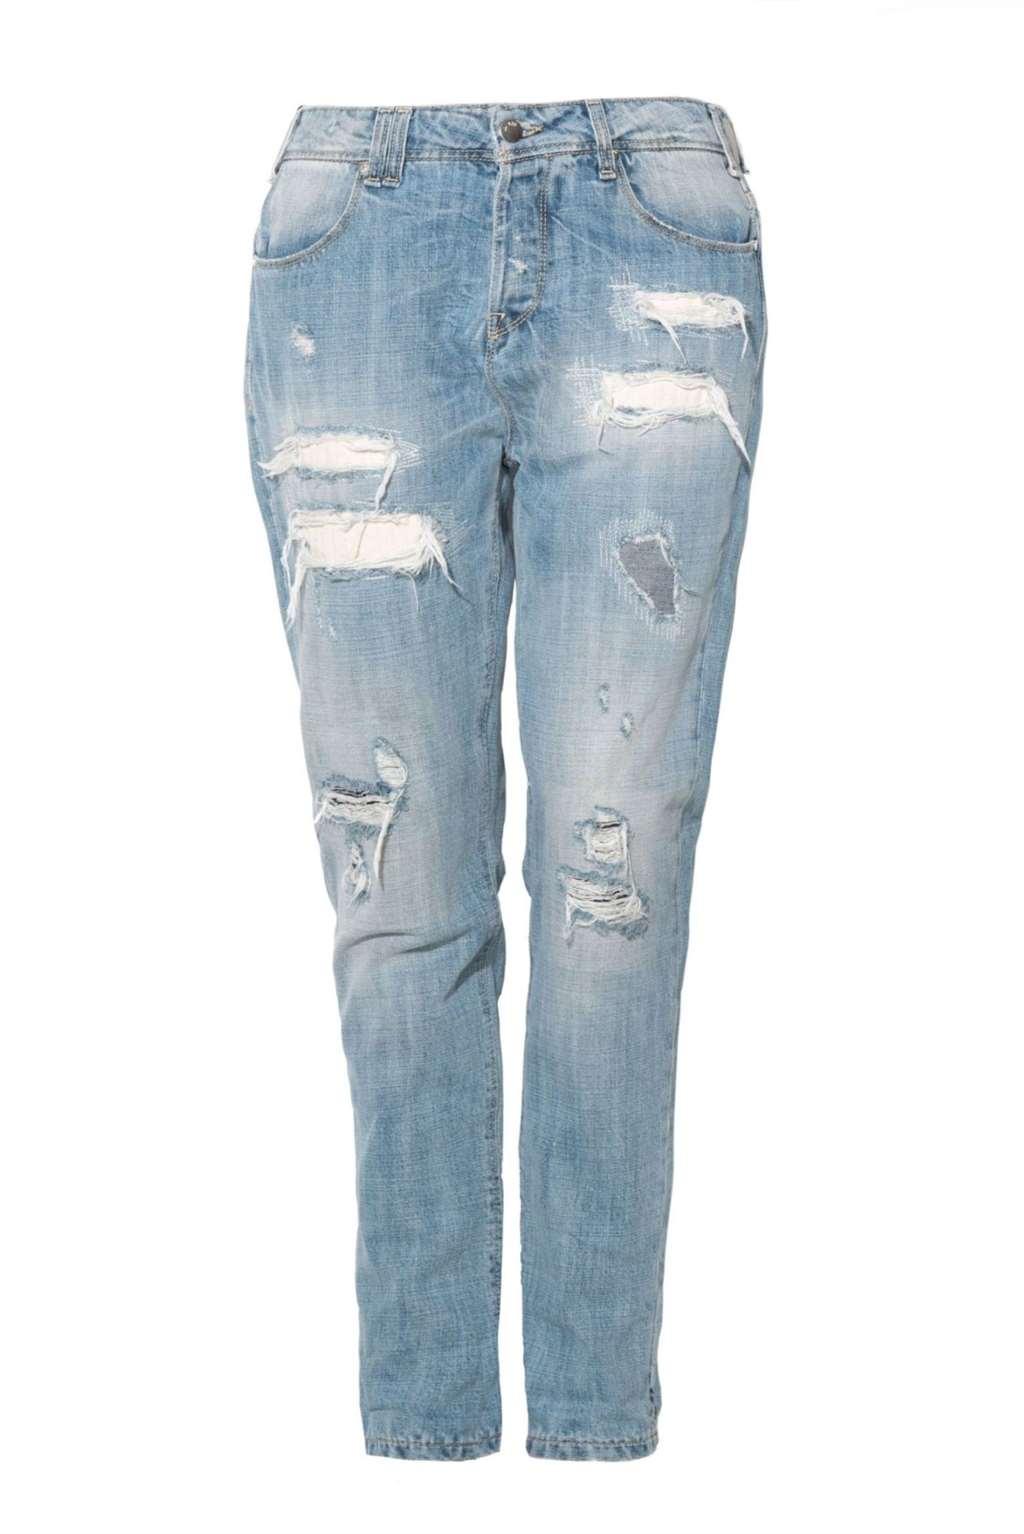 Met Jeans_Fotokredit_fashiondayshu_2